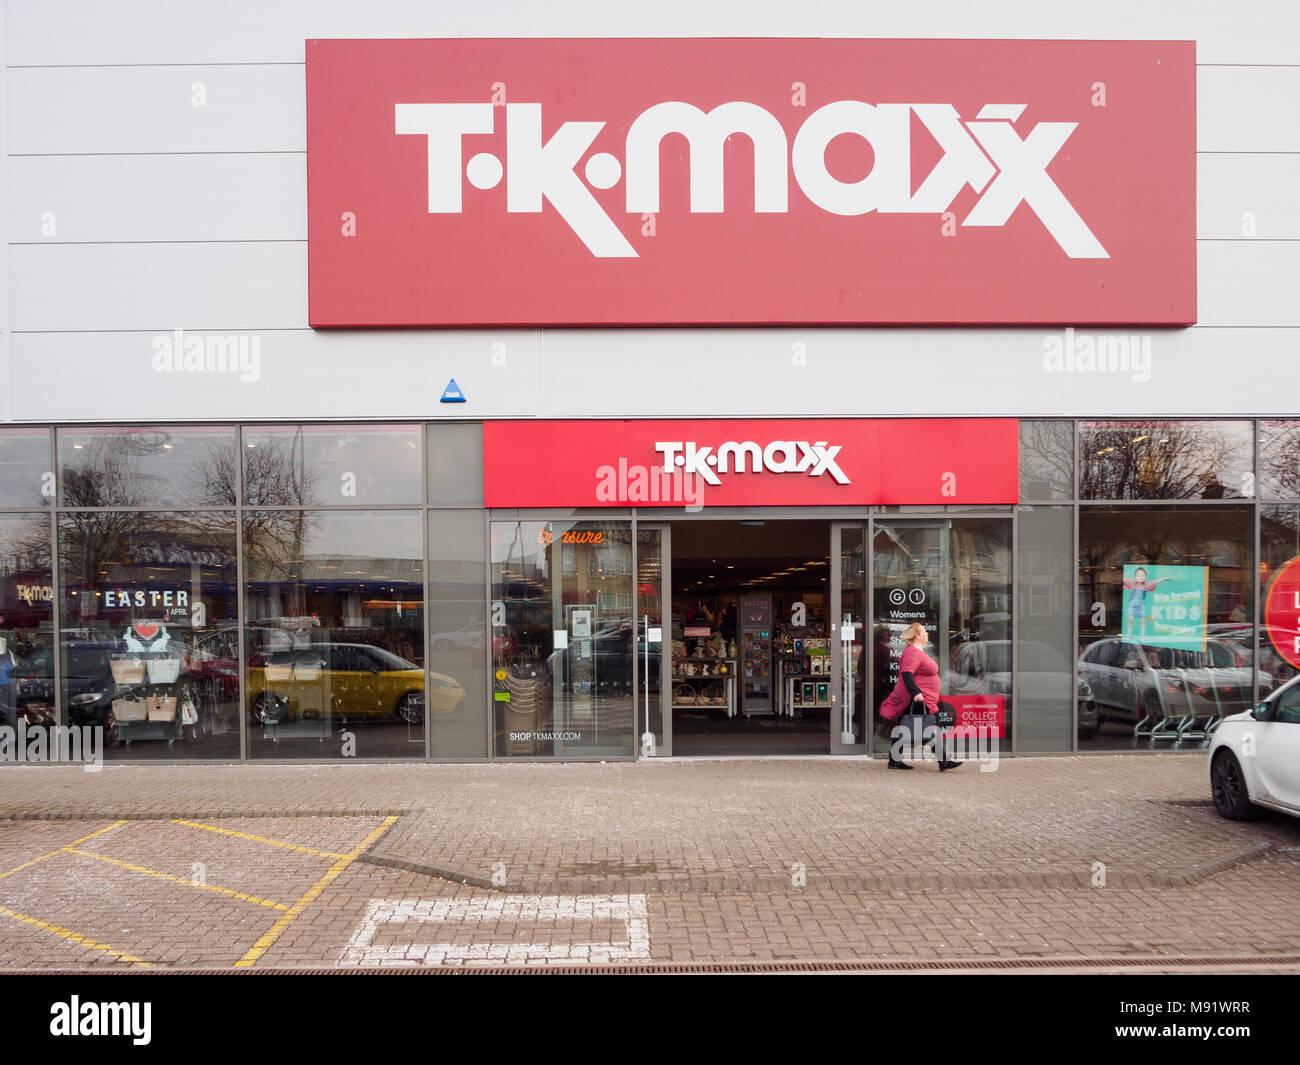 Tk Maxx Stock Photos & Tk Maxx Stock Images - Alamy